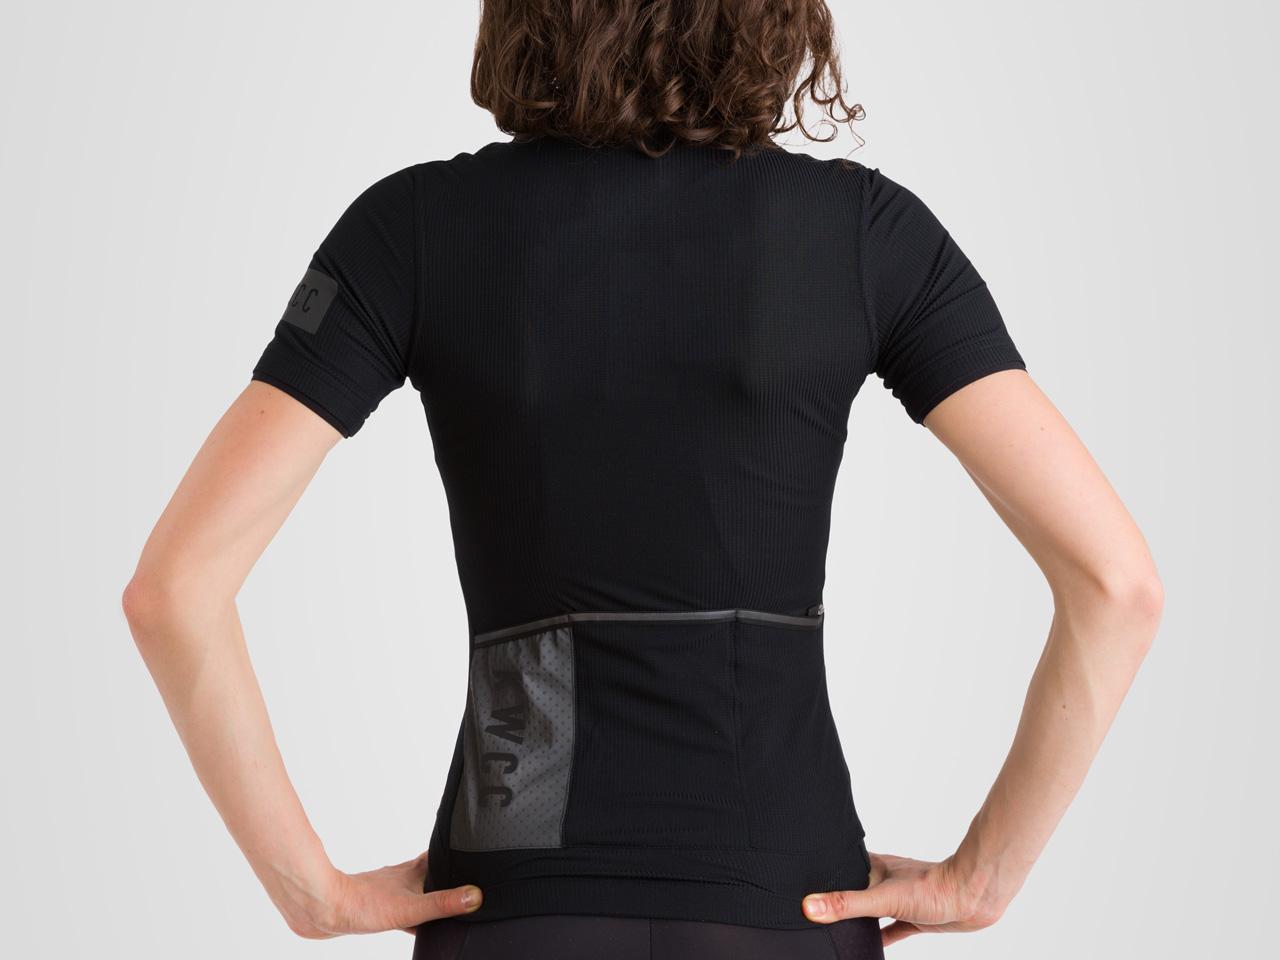 8ad28594c5 Cyklistický dres KWCC Woolight Black (Girl) — Kompot.sk